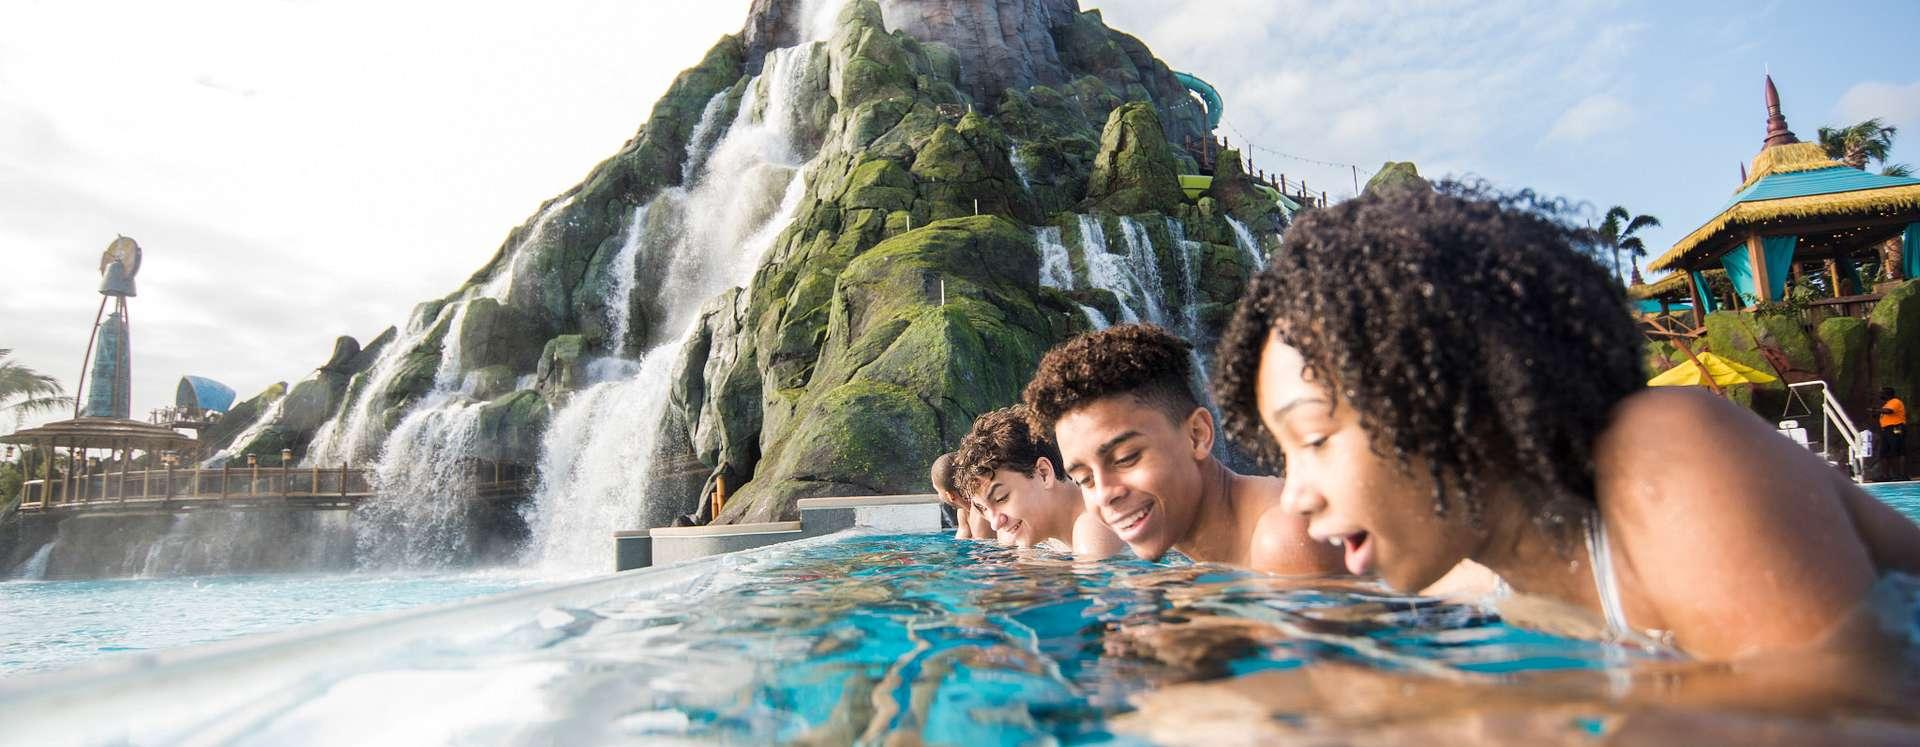 Universal's Volcano Bay™ teens gazing into Reef Leisure Pool